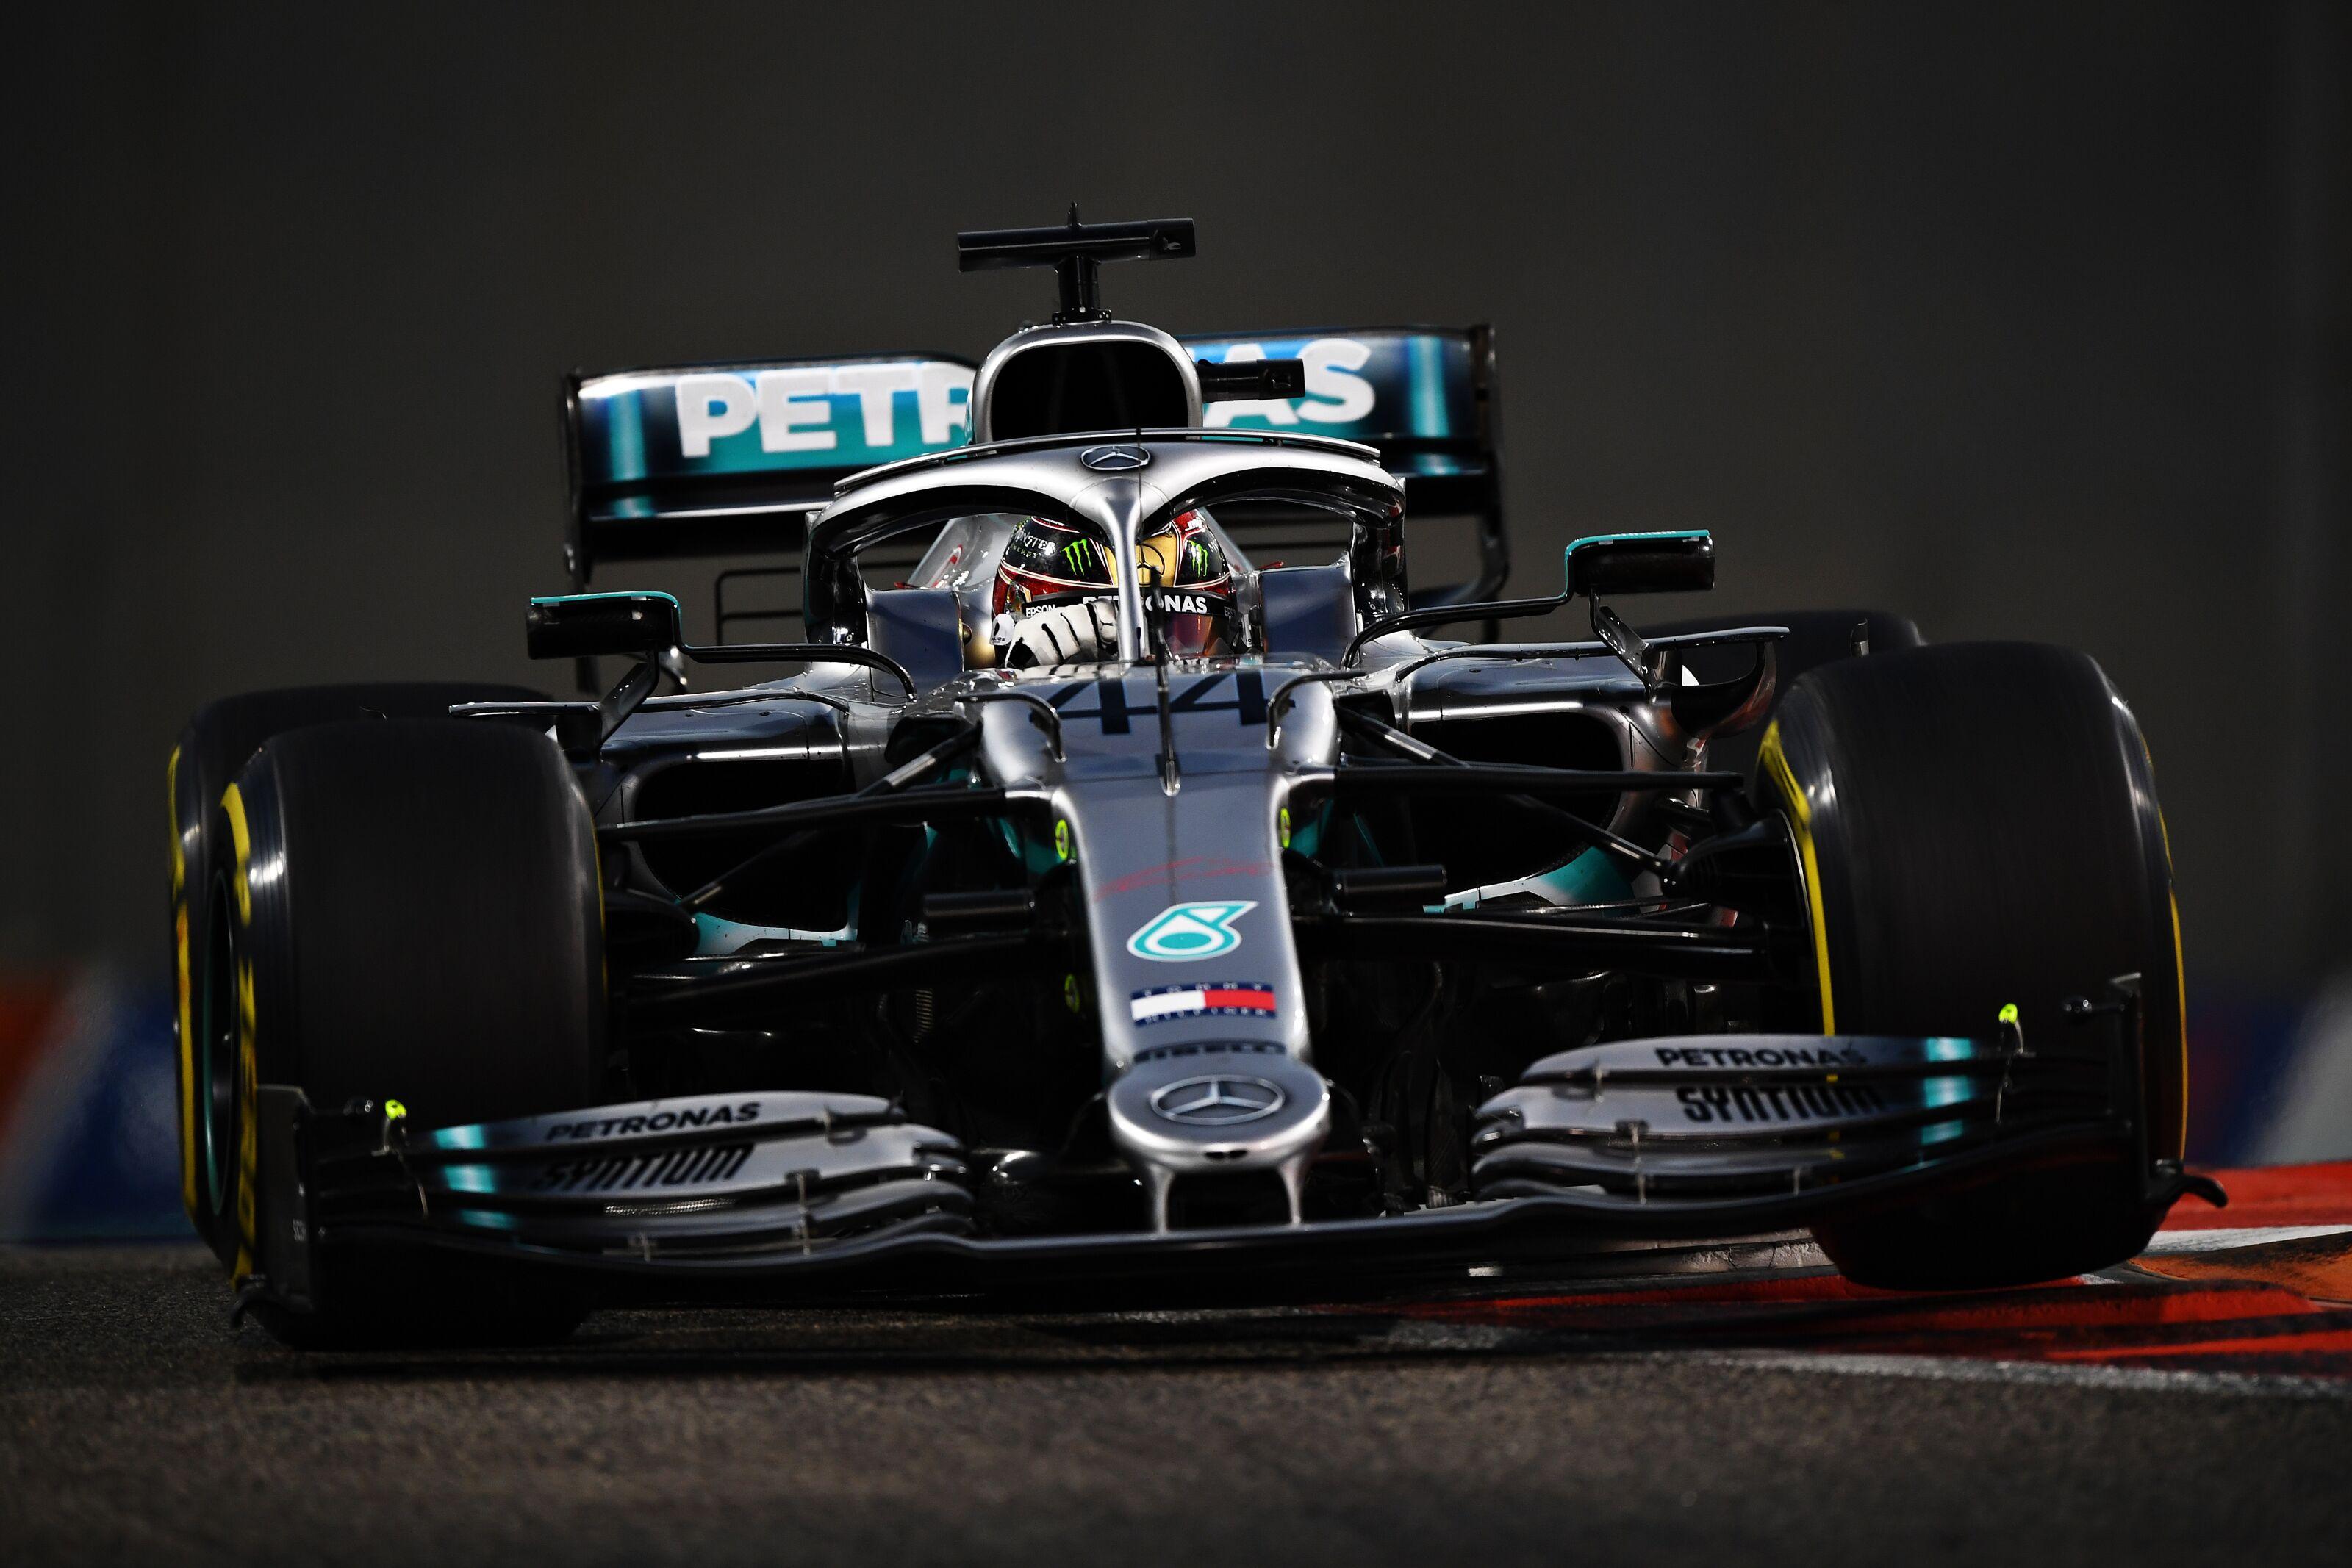 Formula 1: Lewis Hamilton dominates 2019 Abu Dhabi Grand Prix